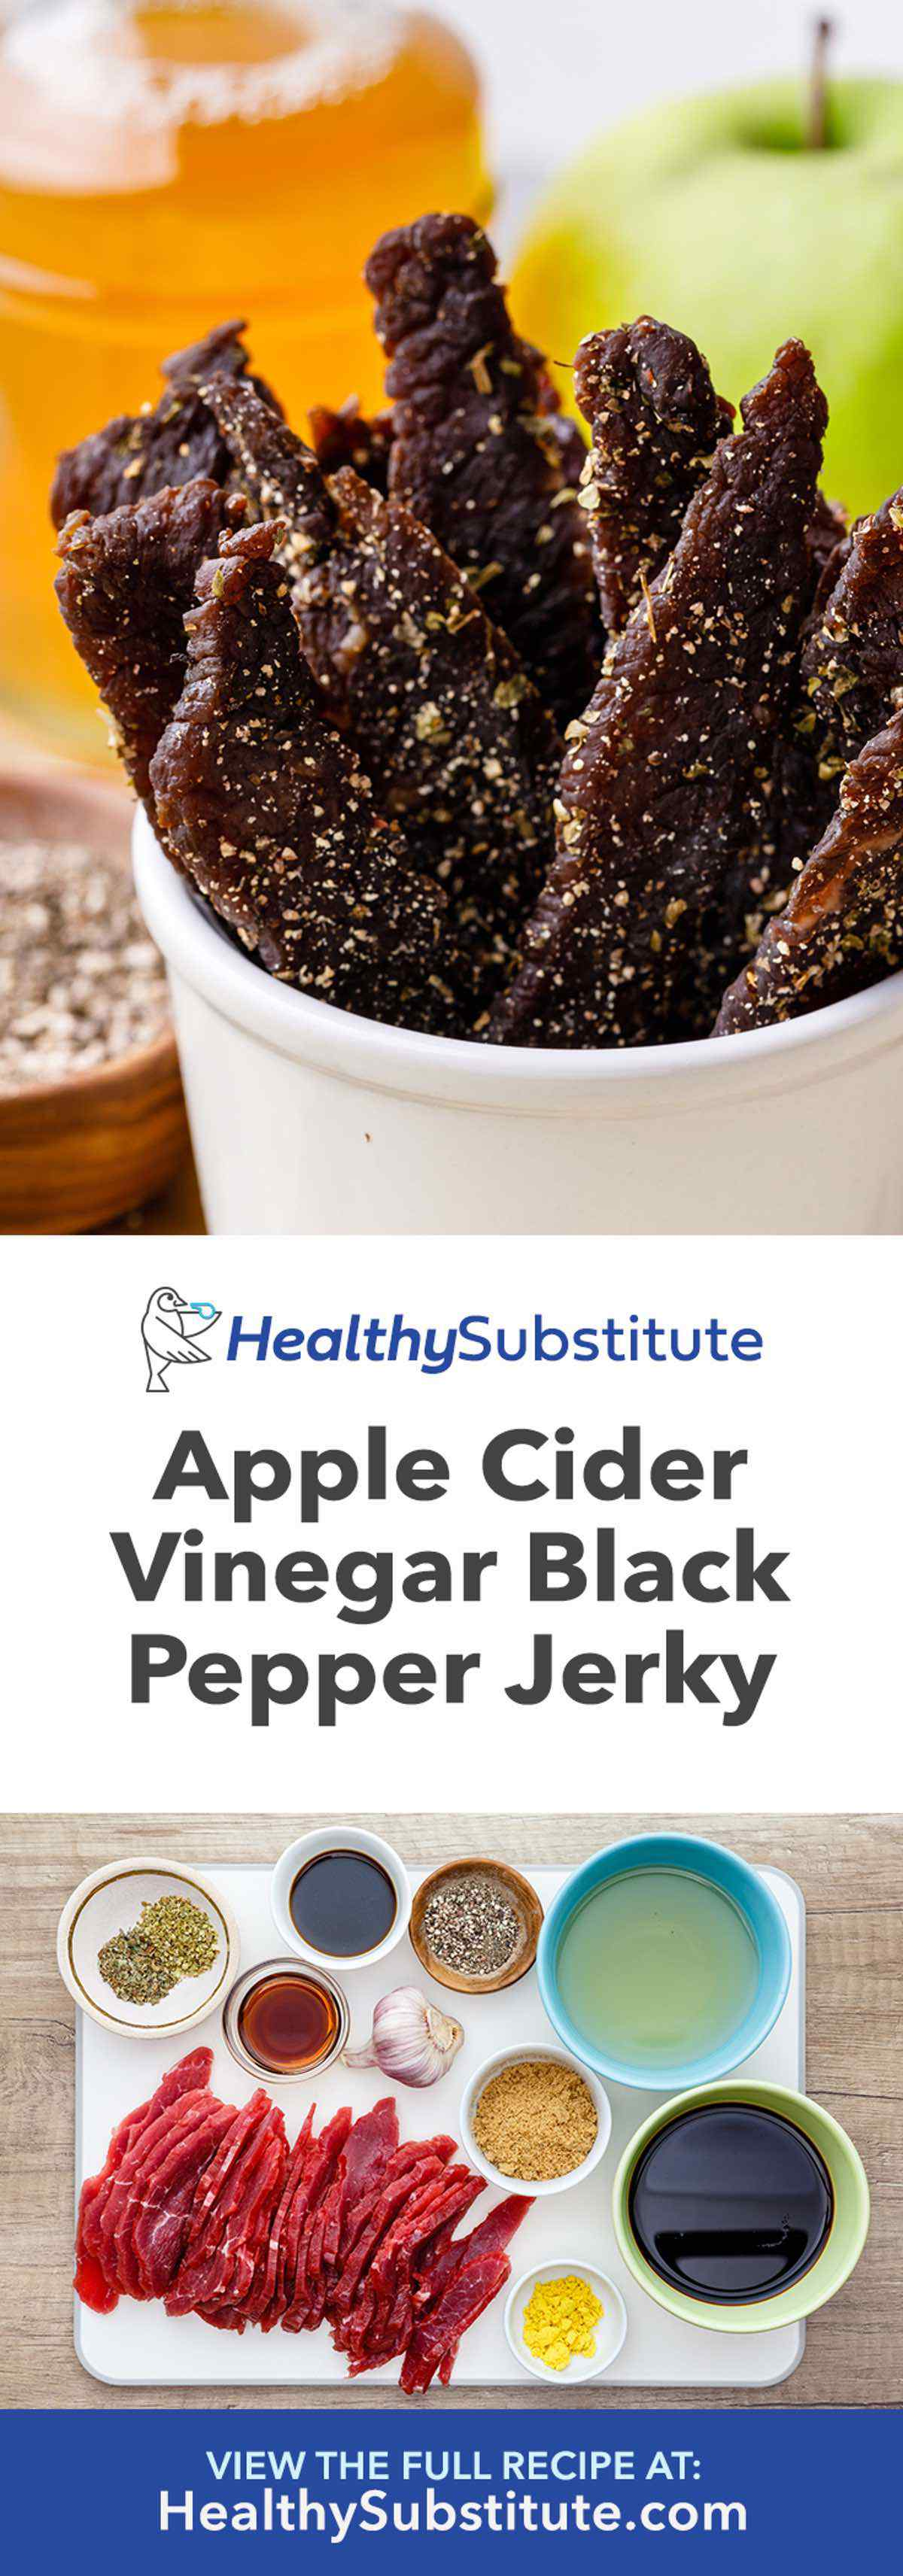 Apple Cider Vinegar Black Pepper Beef Jerky